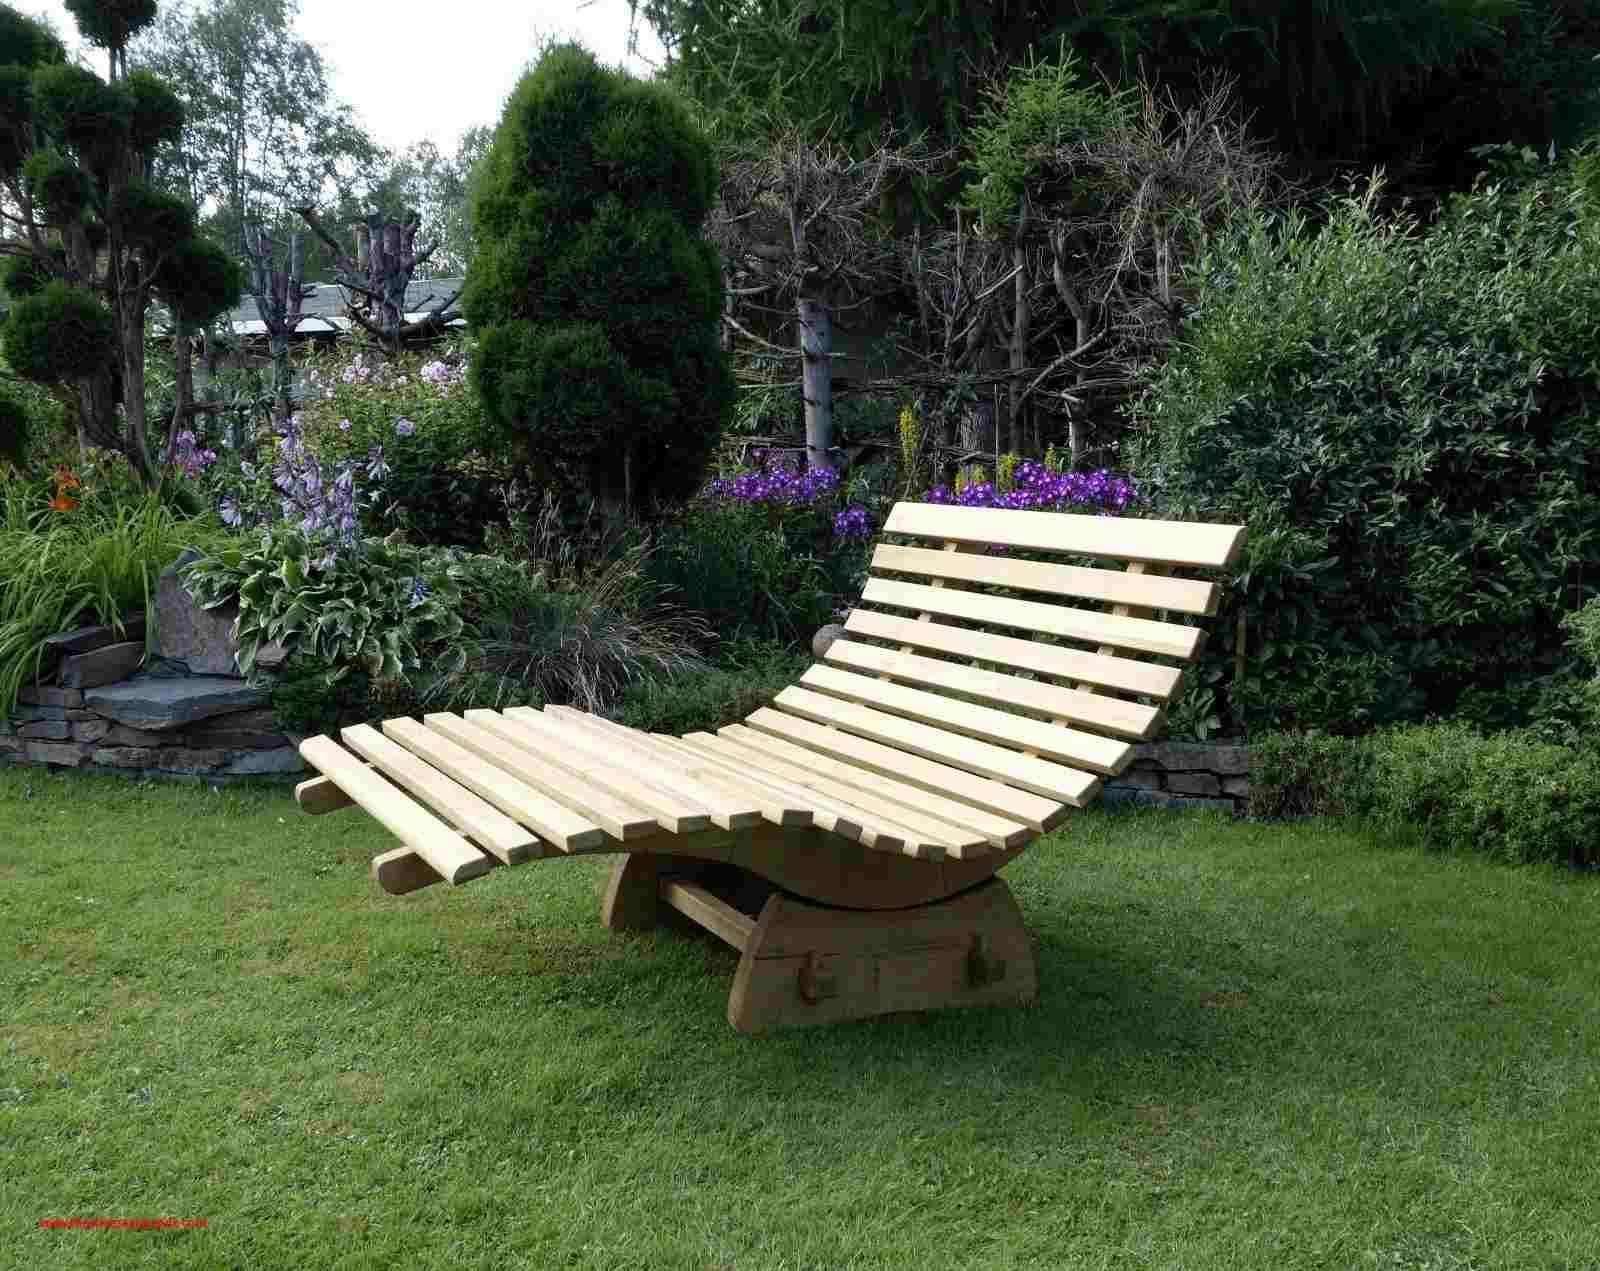 34 Elegant Holzliege Garten Garten Gallerie Ideen Outdoor Chairs